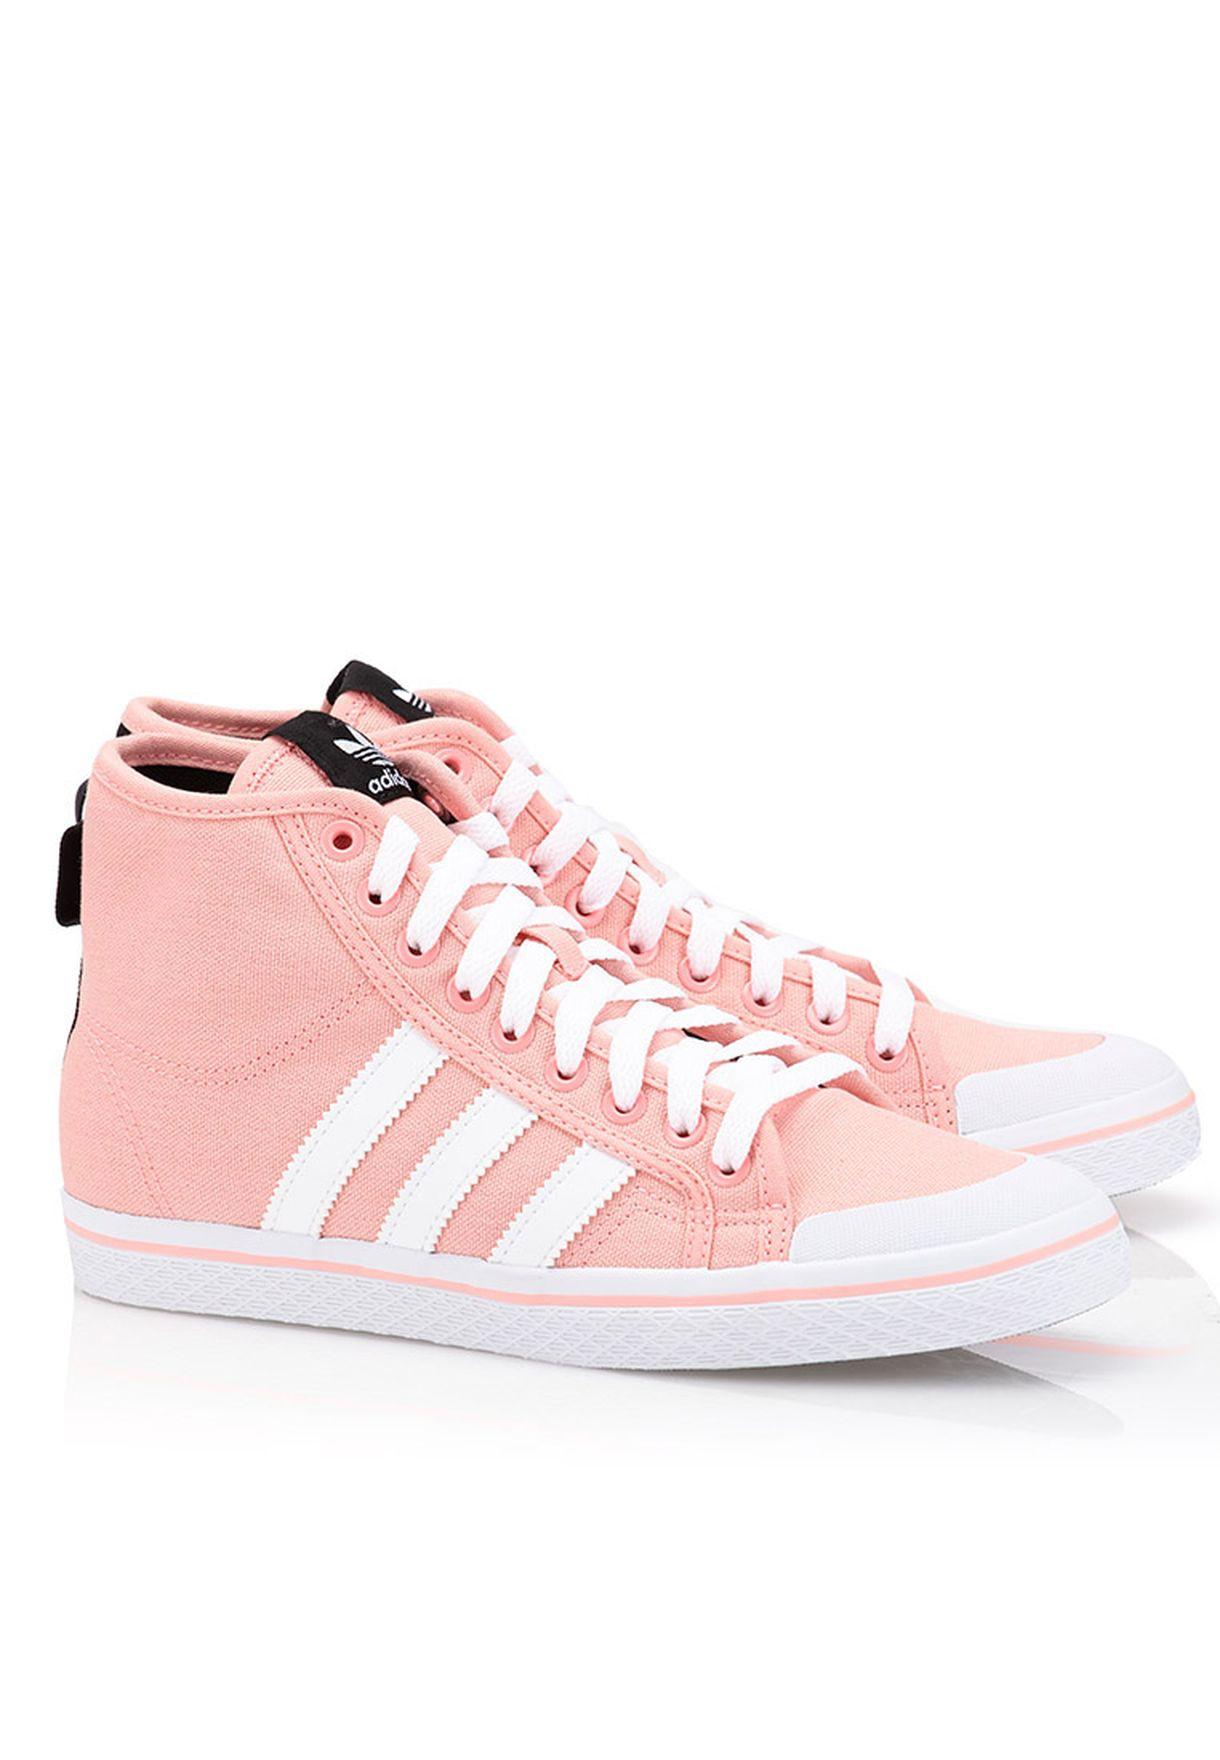 Honey Women In Adidas Sneakers Shop For M19701 Mid Pink Originals z8wpxFt